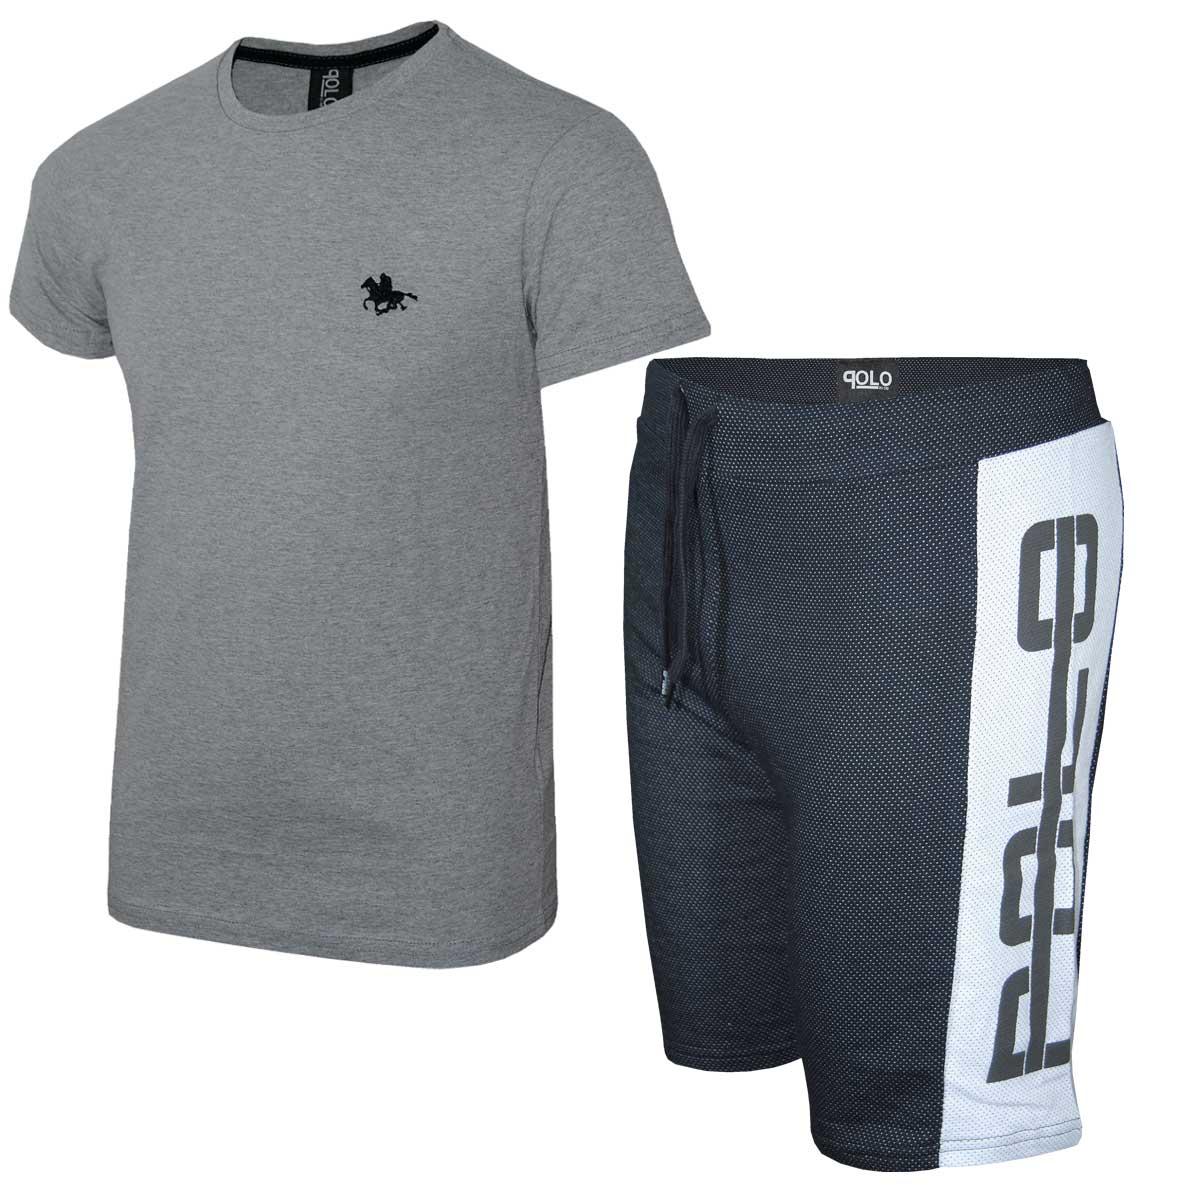 Kit Camiseta Cinza e Bermuda Preta Polo RG518